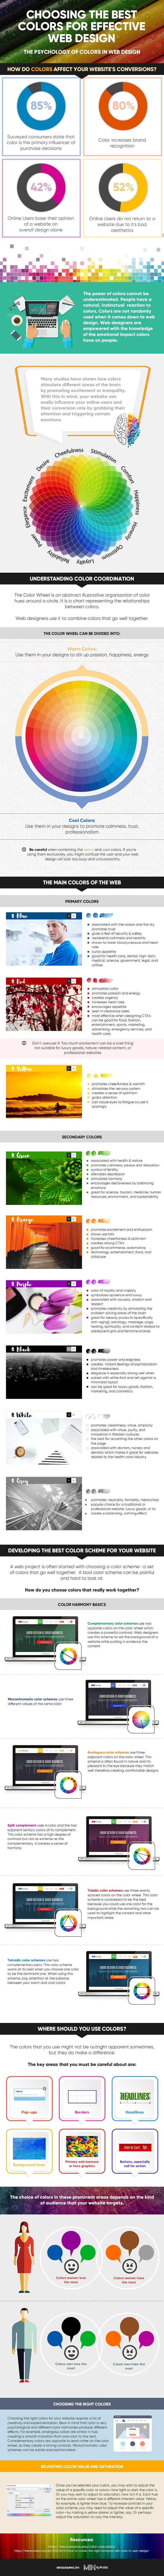 Colors web design psychology - Infographic Choosing The Best Colors For Effective Web Design Designtaxi Com Psychology